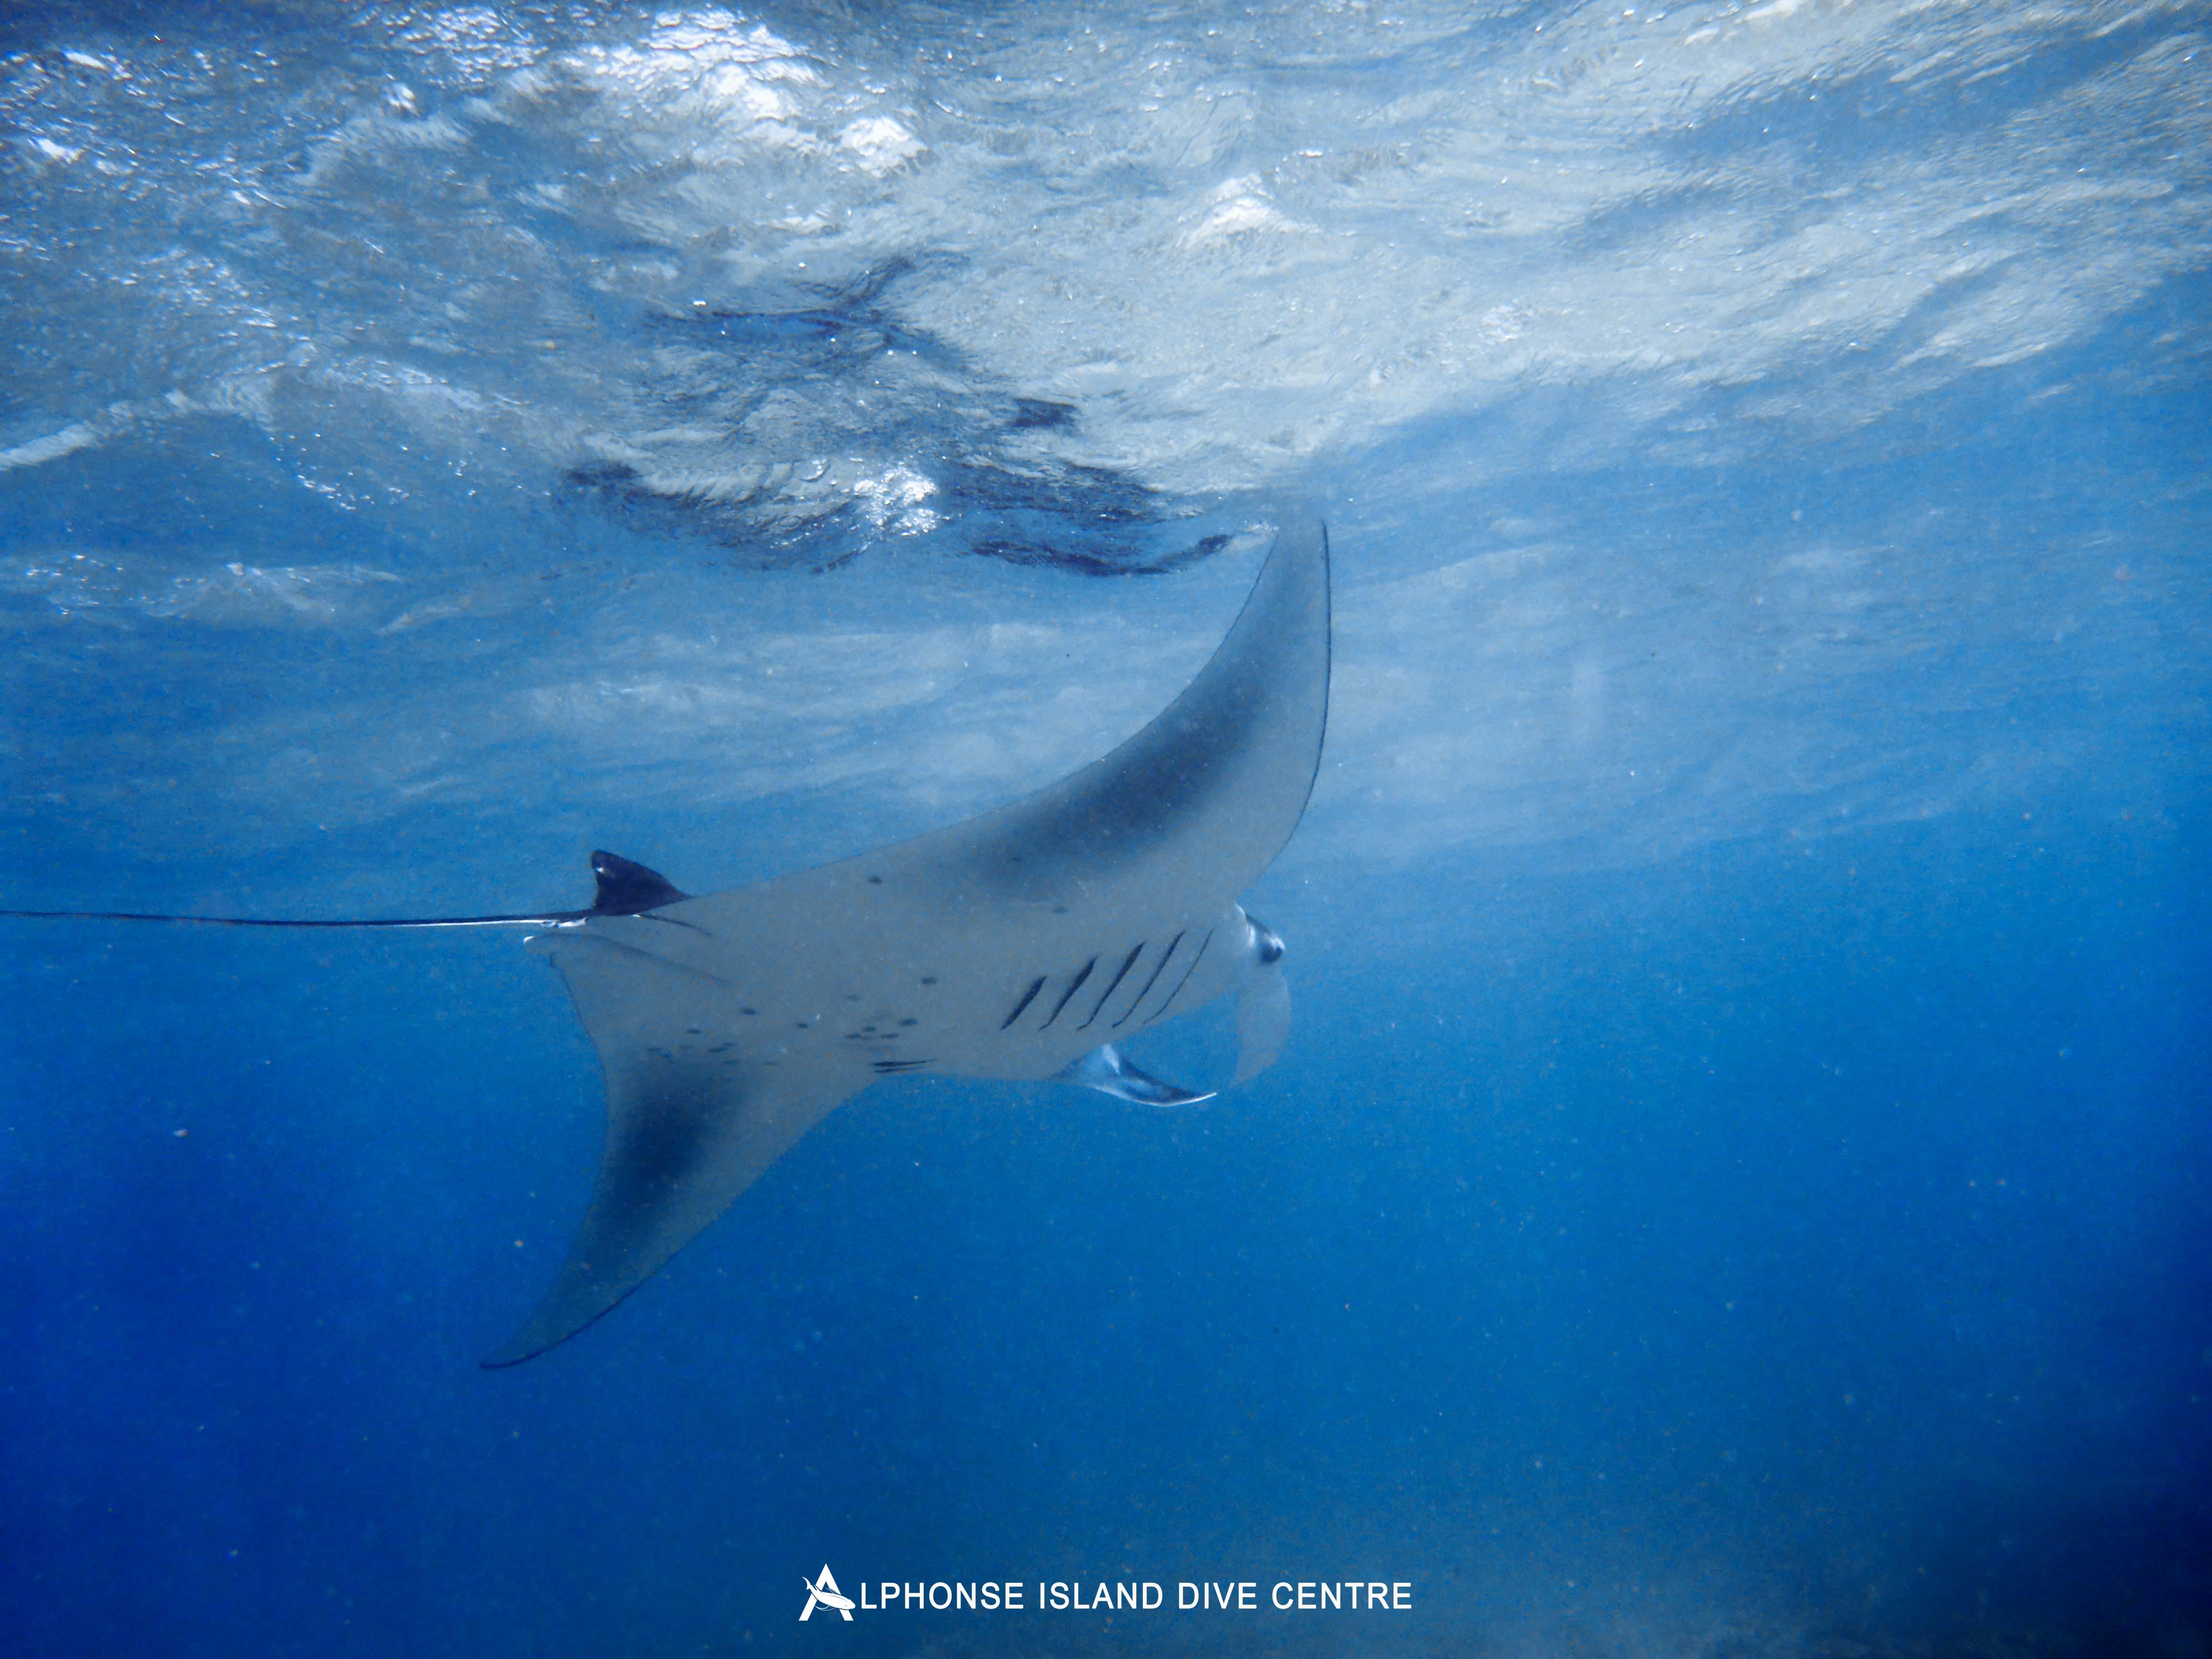 Alphonse Island Seychelles diving